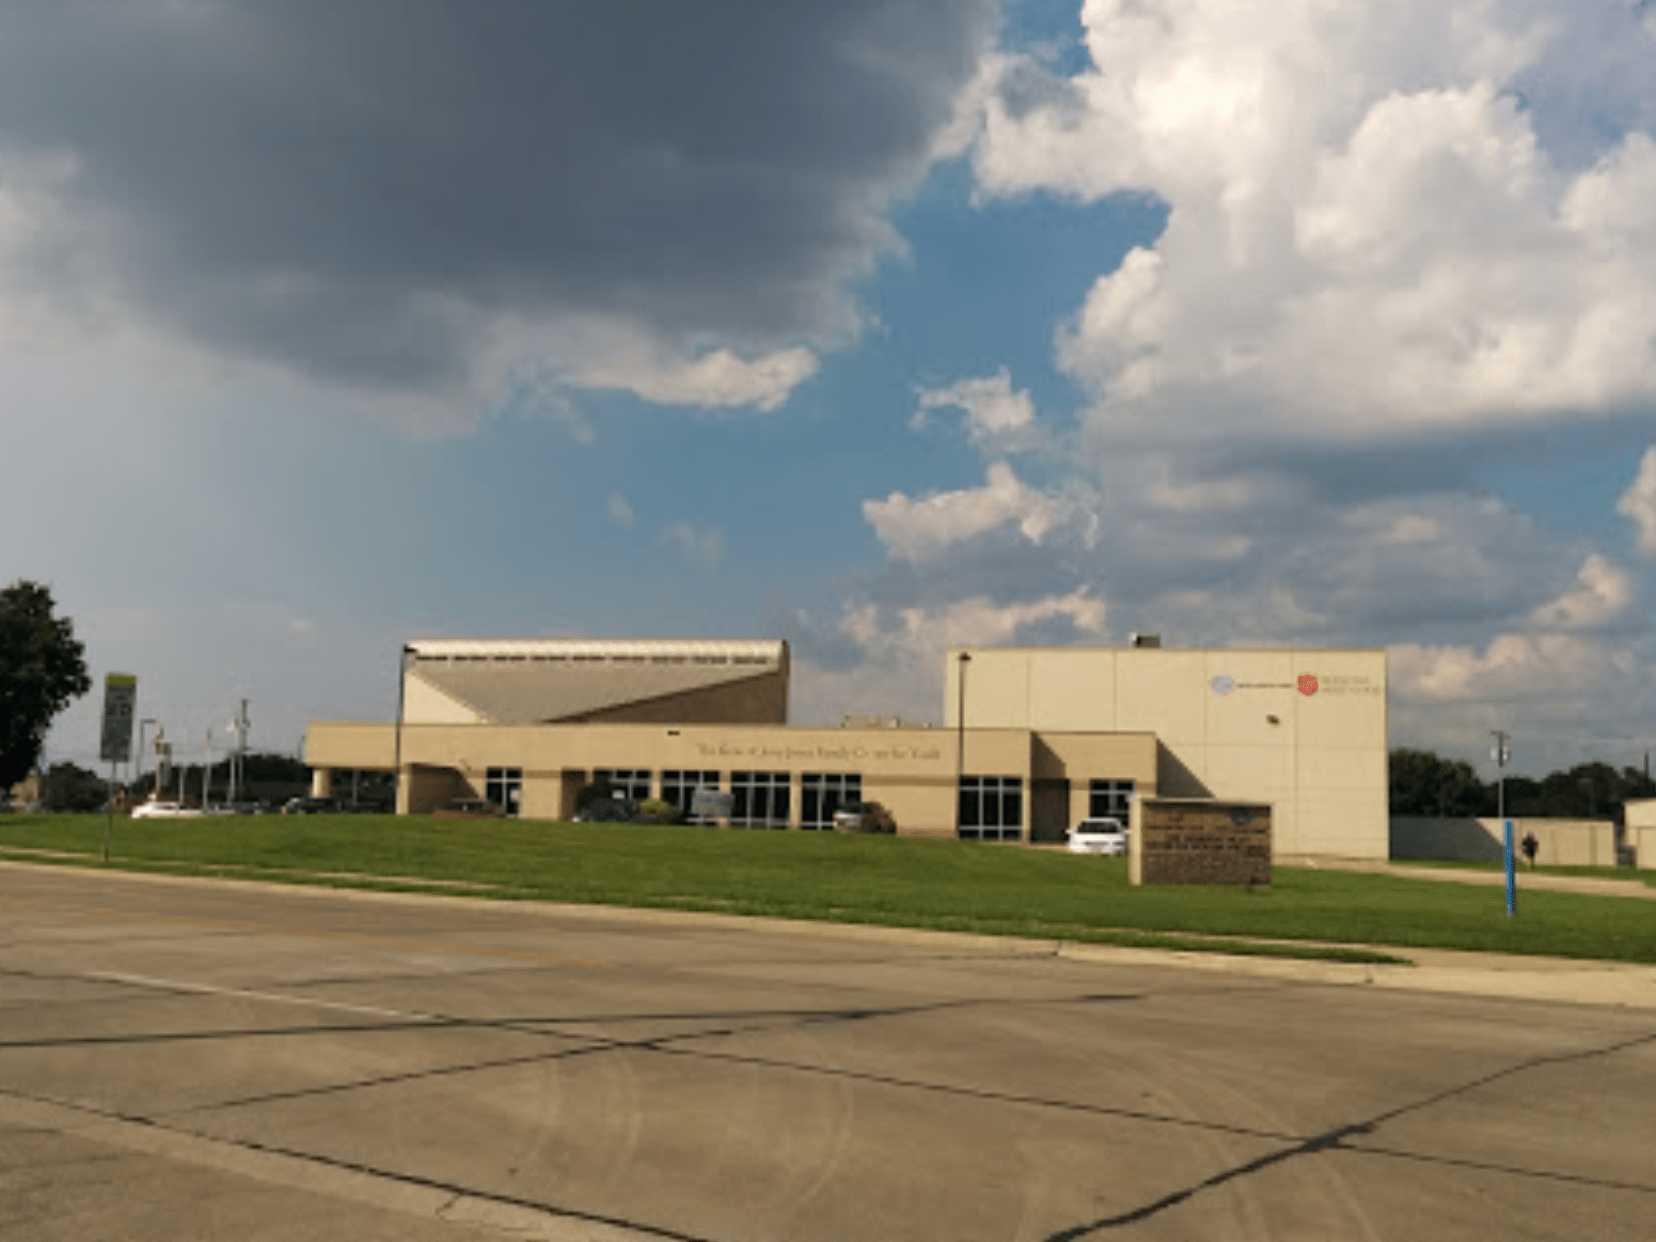 Dallas/Irving Corps Community Center